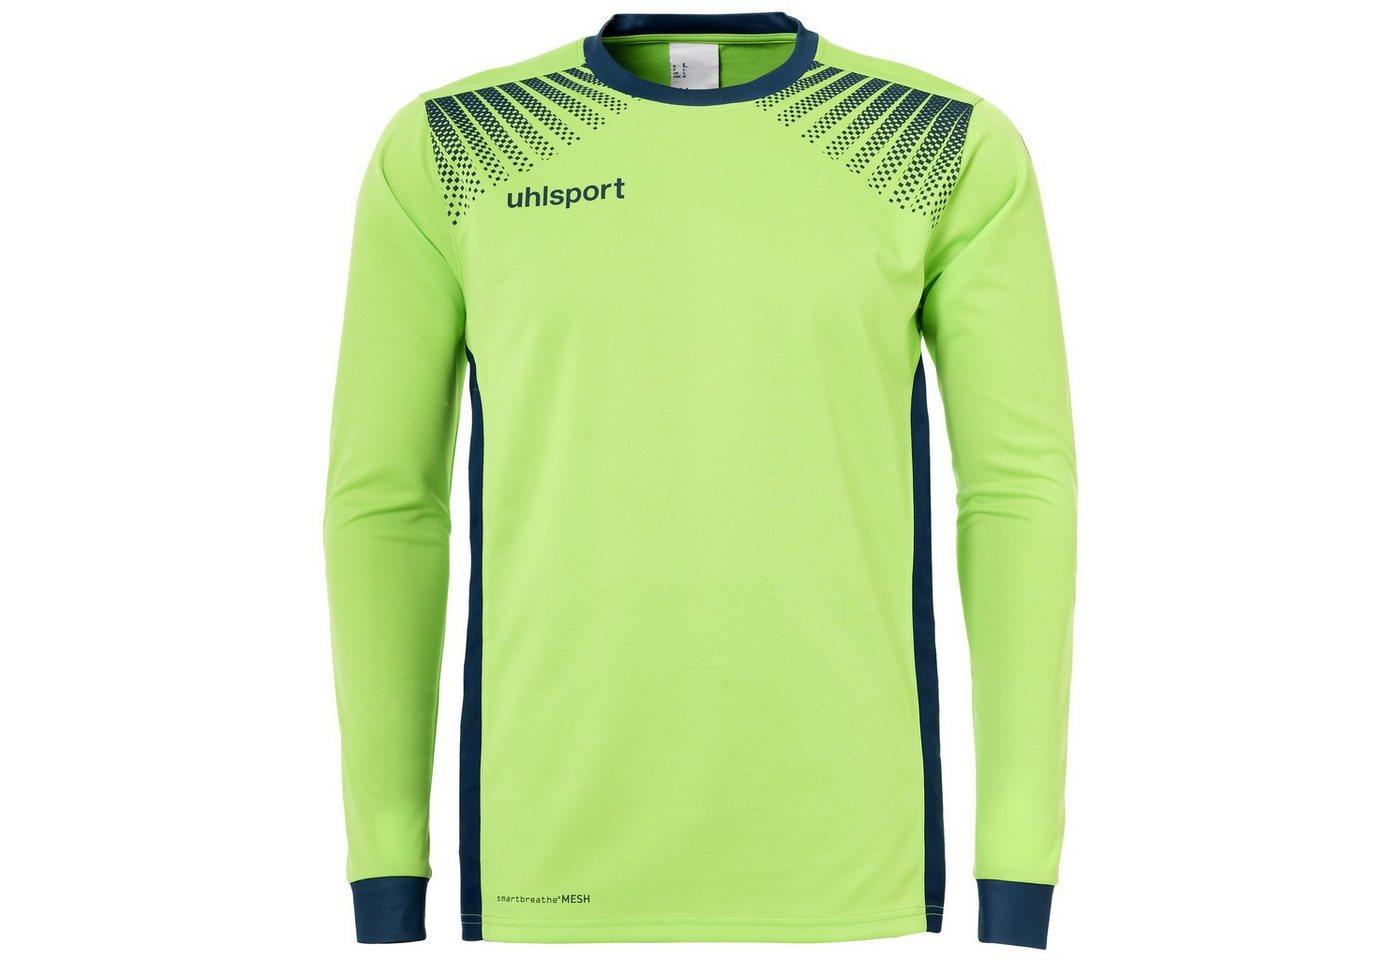 Uhlsport Goal Torwartshirt Langarm Herren | Sportbekleidung > Sportshirts > T-Shirts | Grün | Polyester | Uhlsport